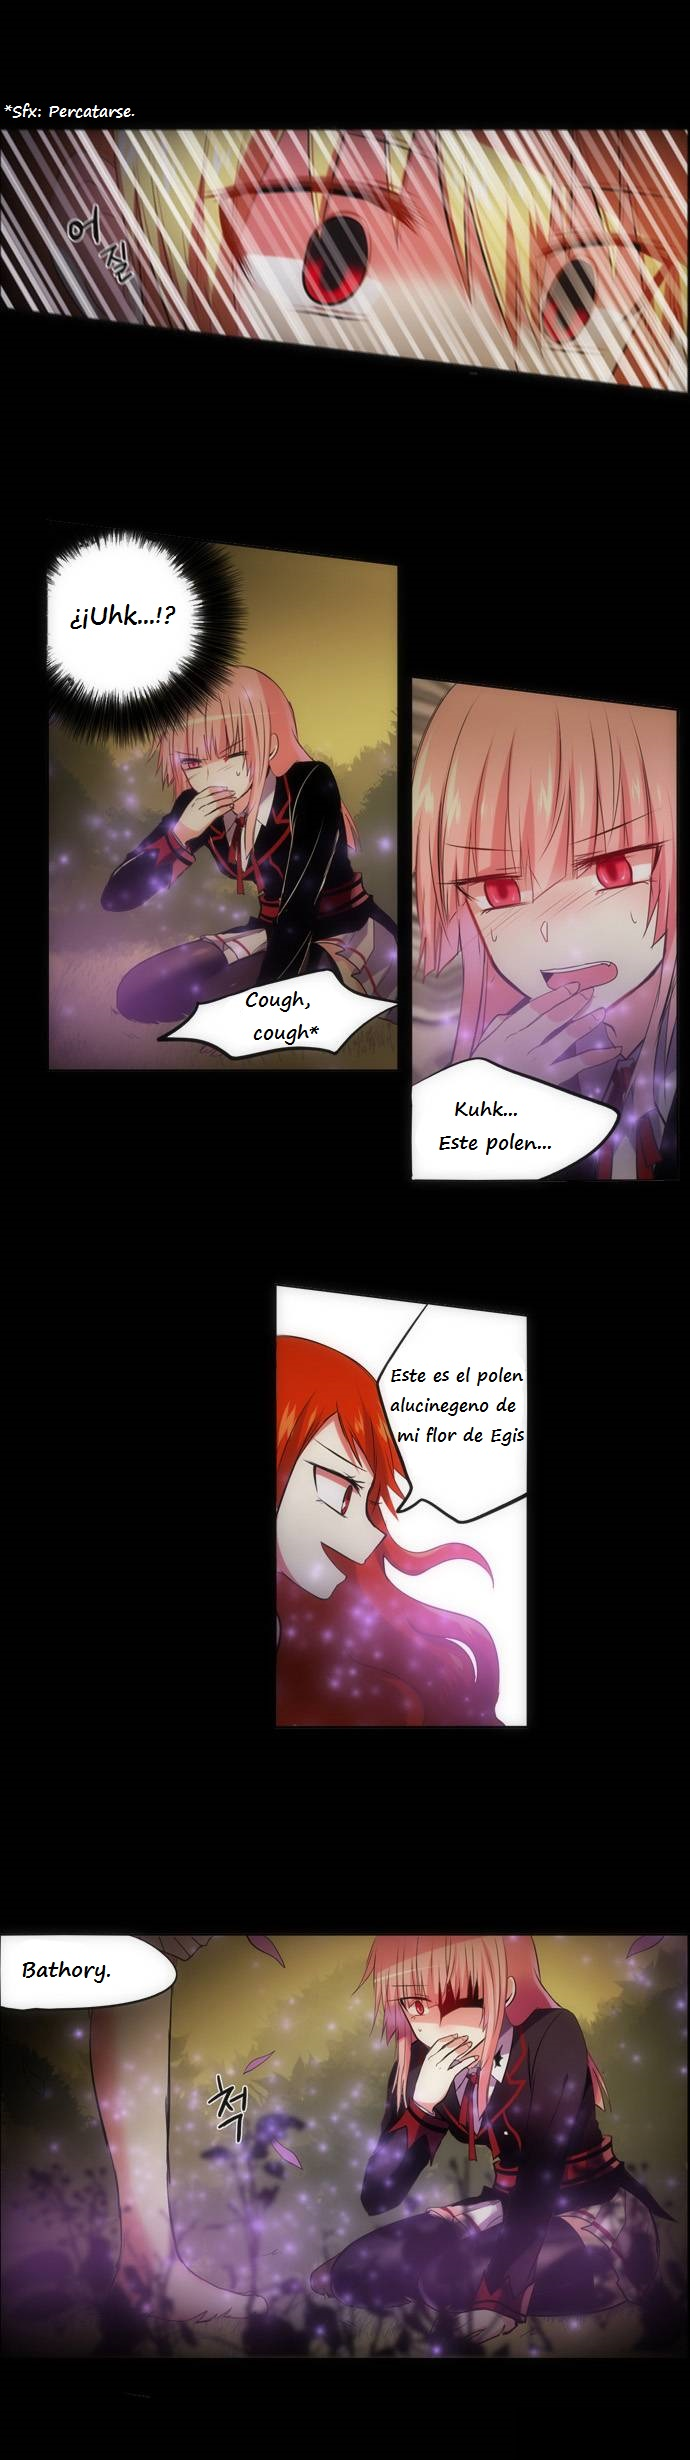 http://c5.ninemanga.com/es_manga/4/836/384796/89013d8e1ded12e8068a49d8ce568da3.jpg Page 5